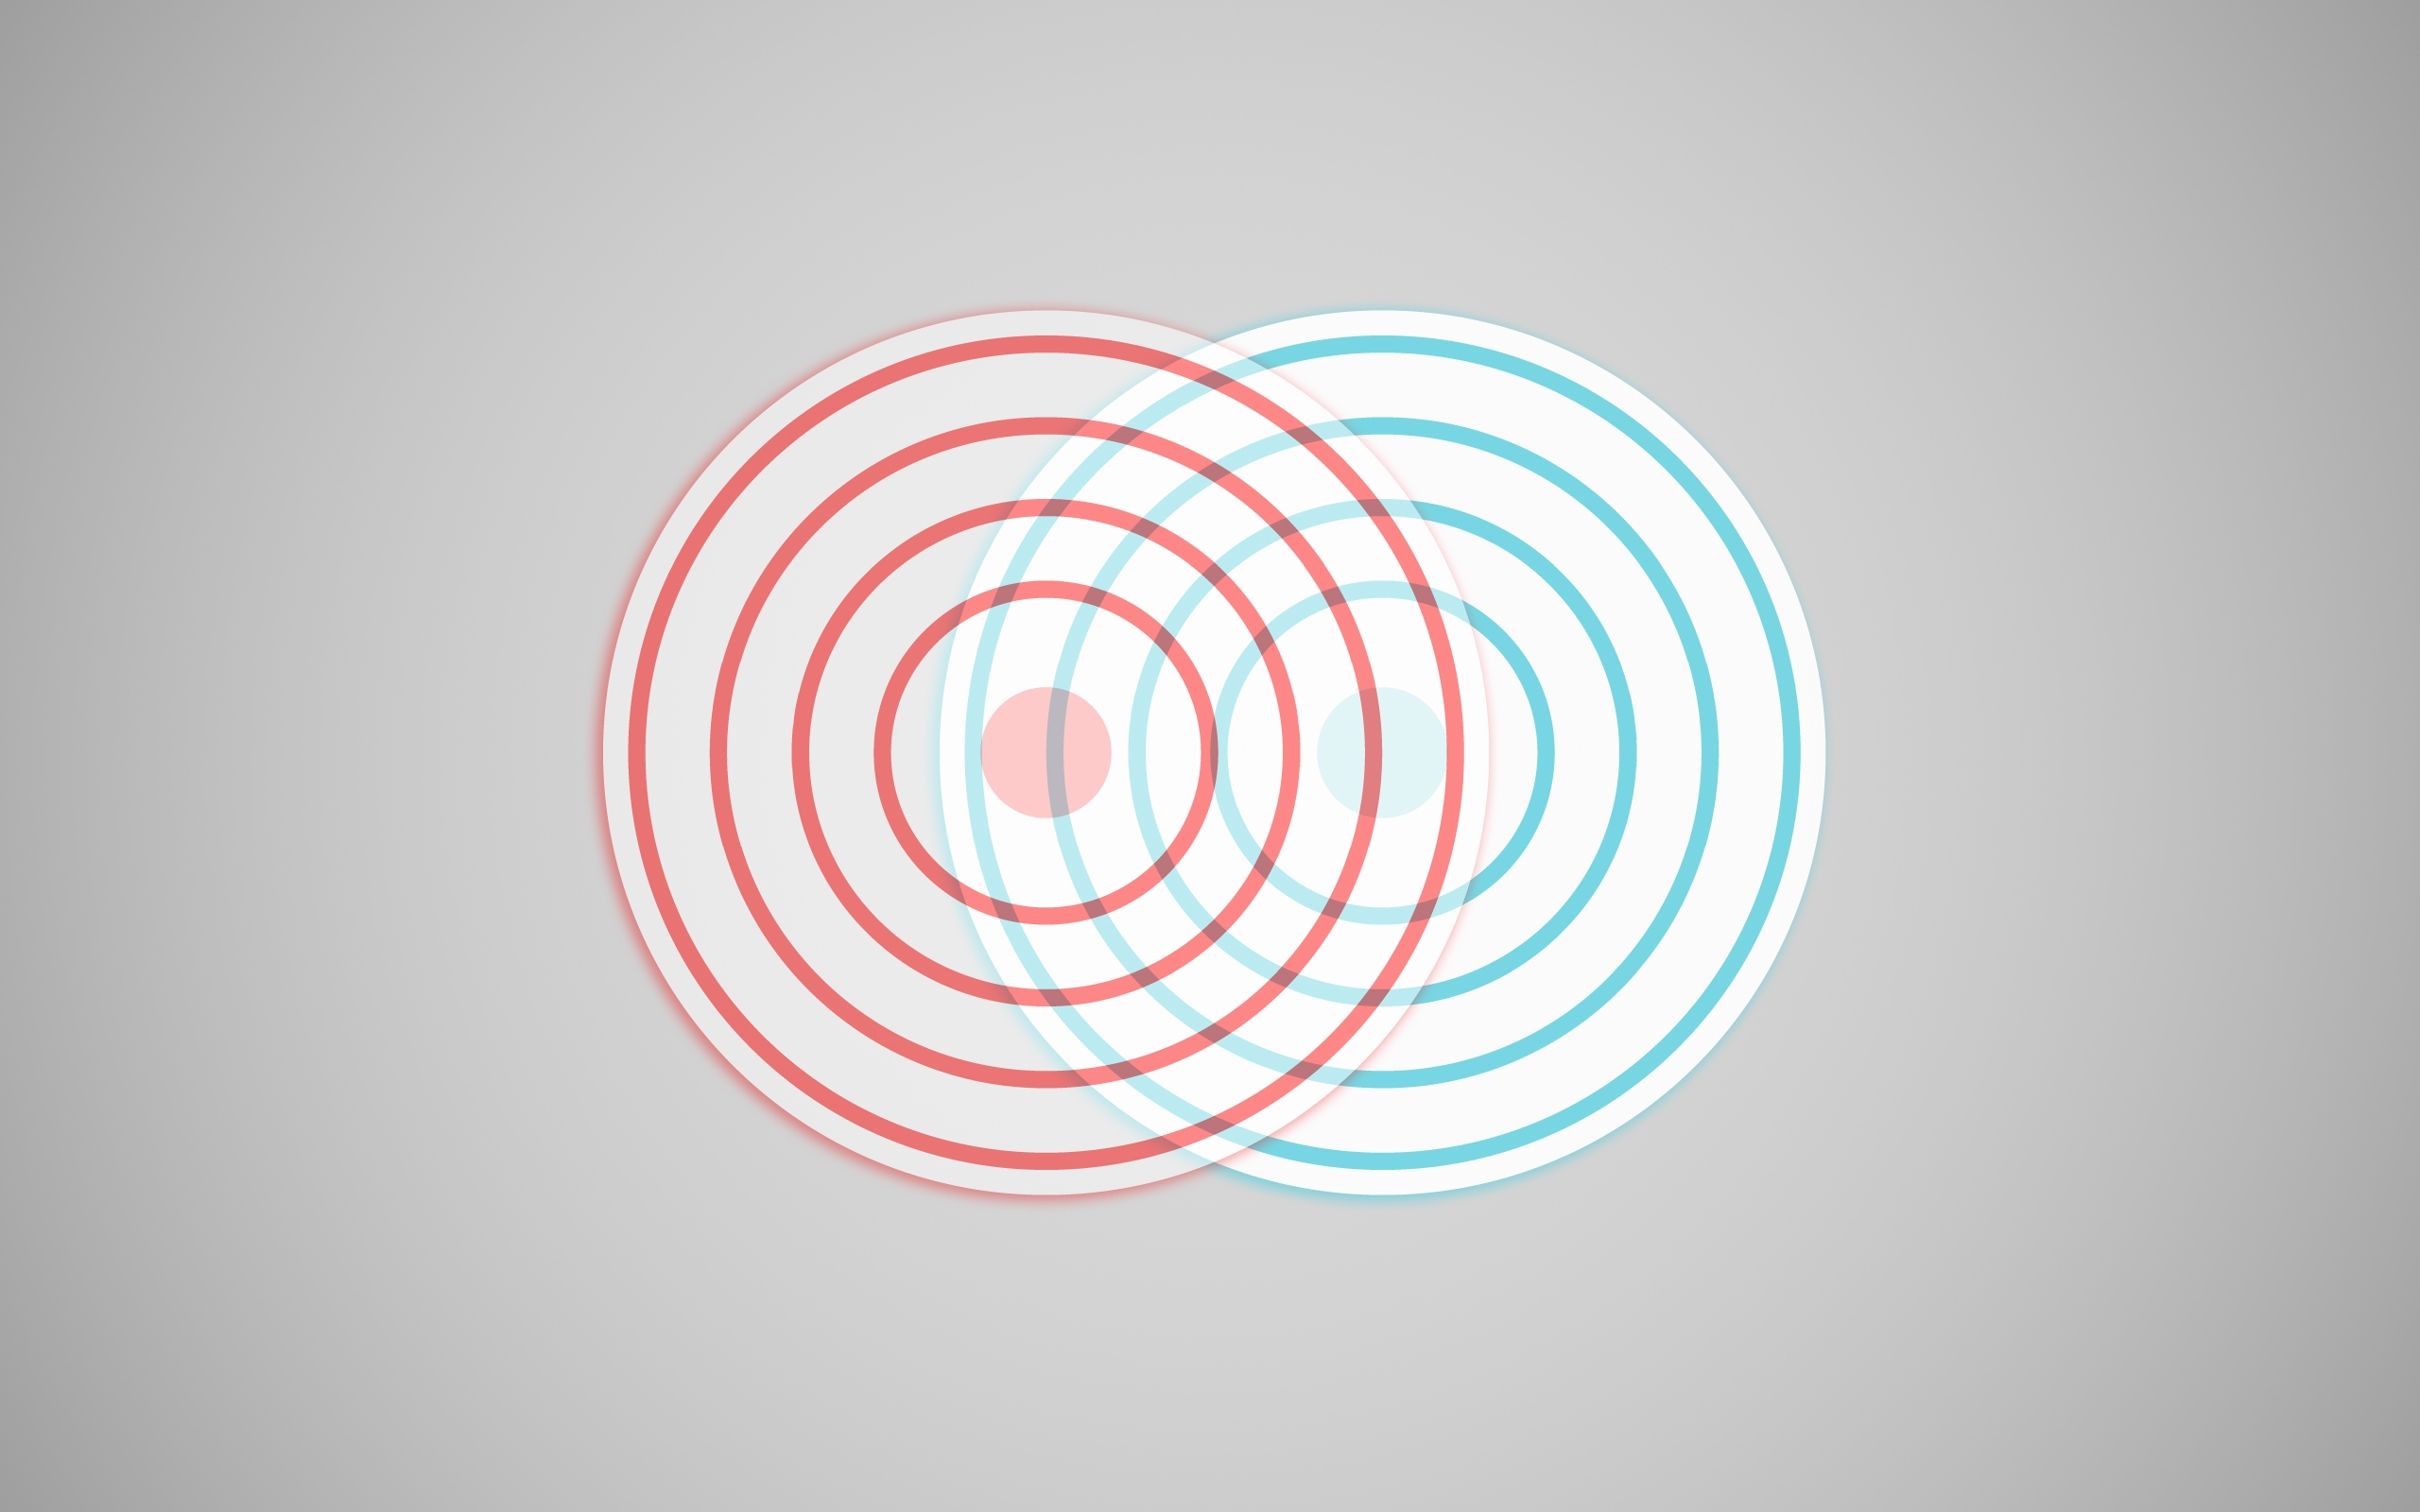 Pin Red Glow 2560x1600 Hd Wallpaper 2560x1600